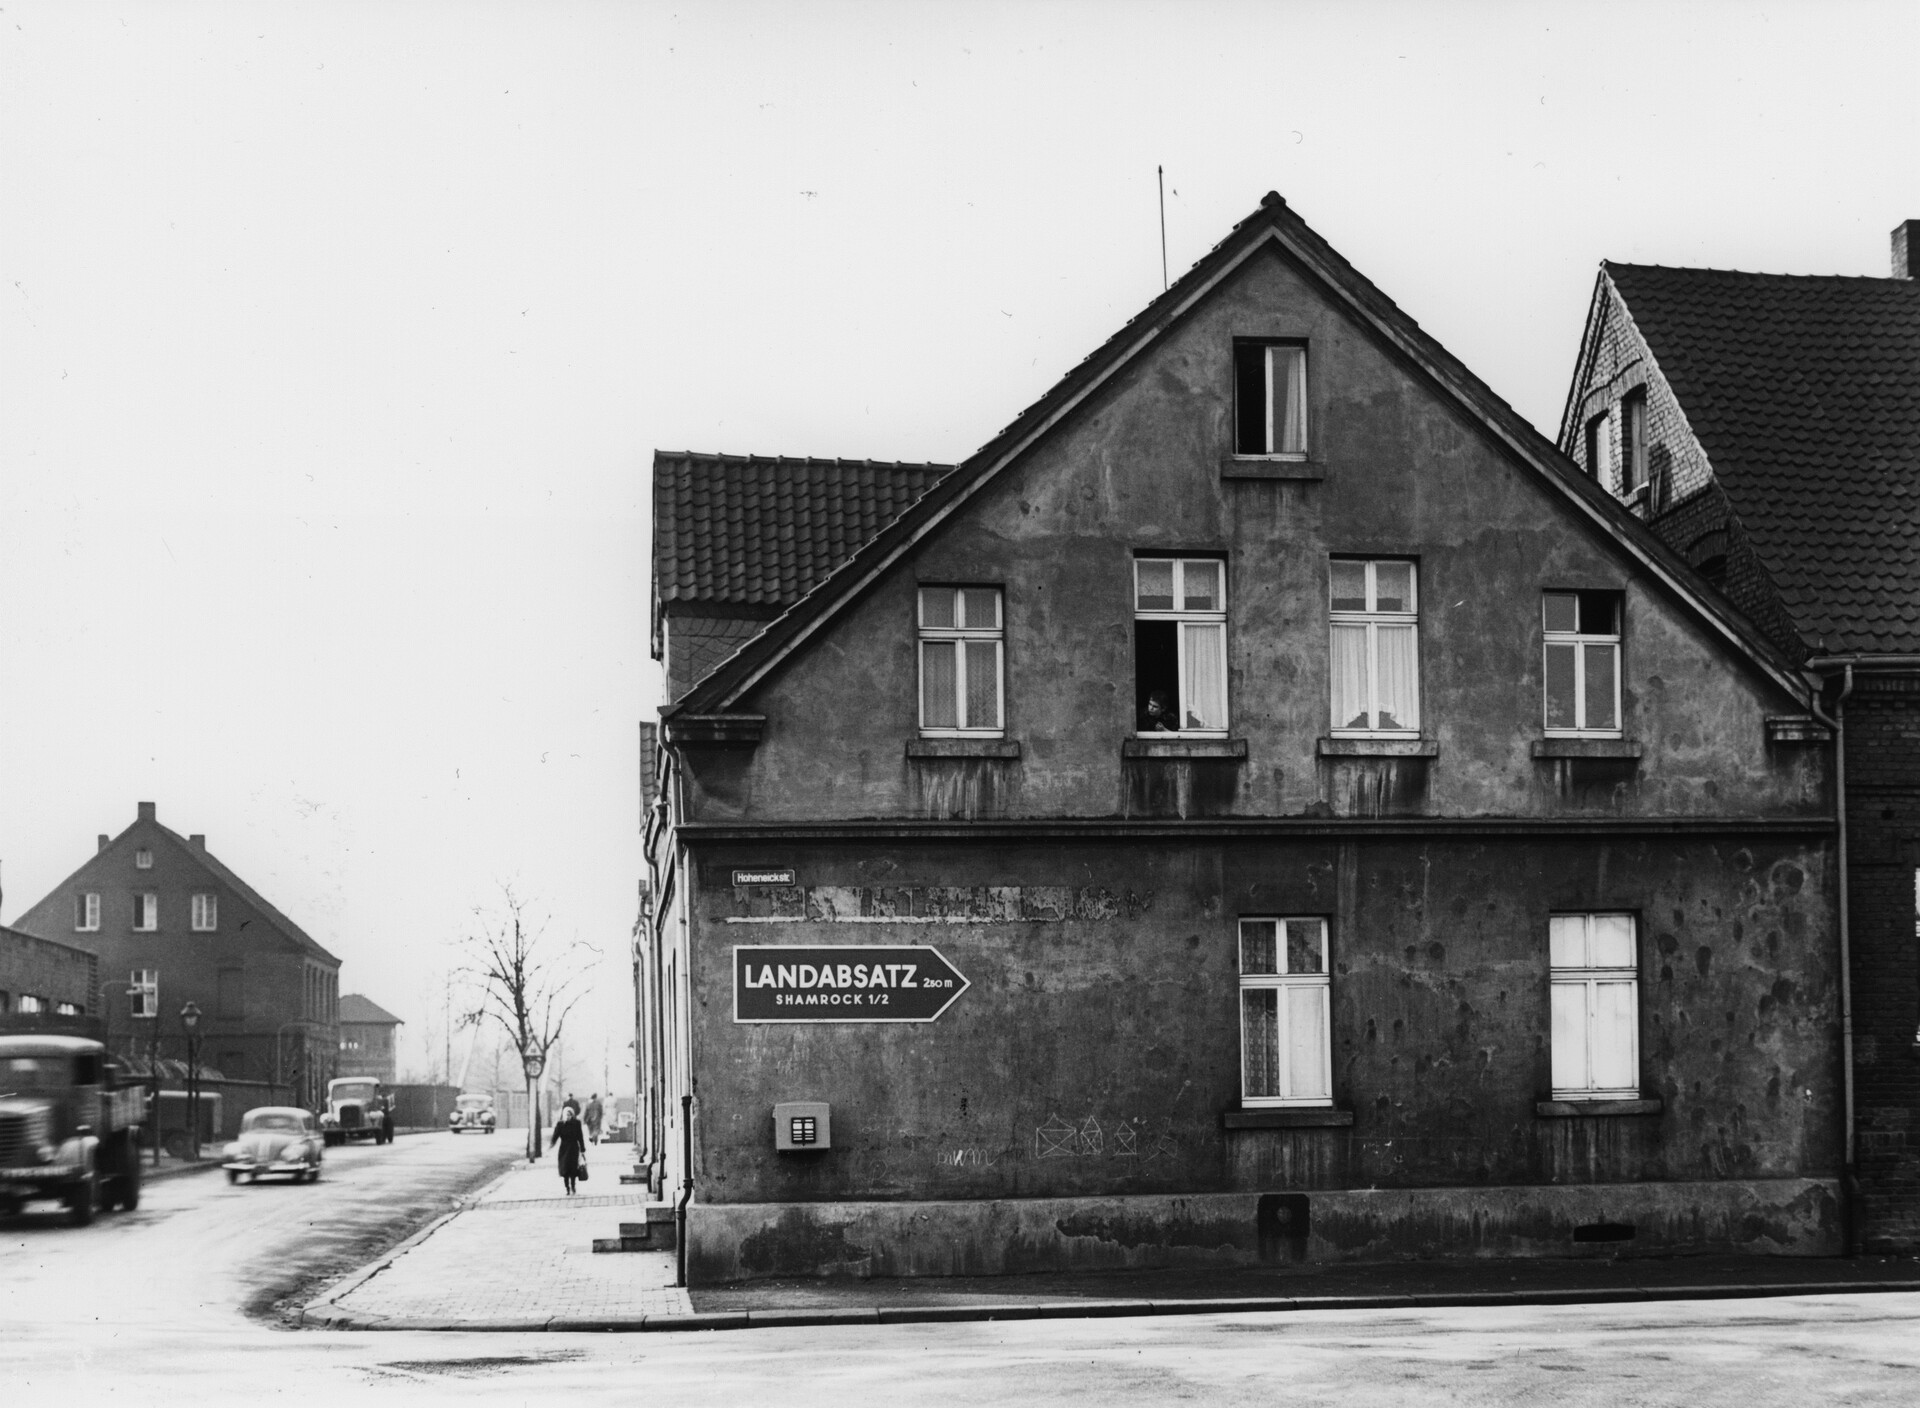 LANDABSATZ Shamrock I_II Hoheneickstraße.jpg